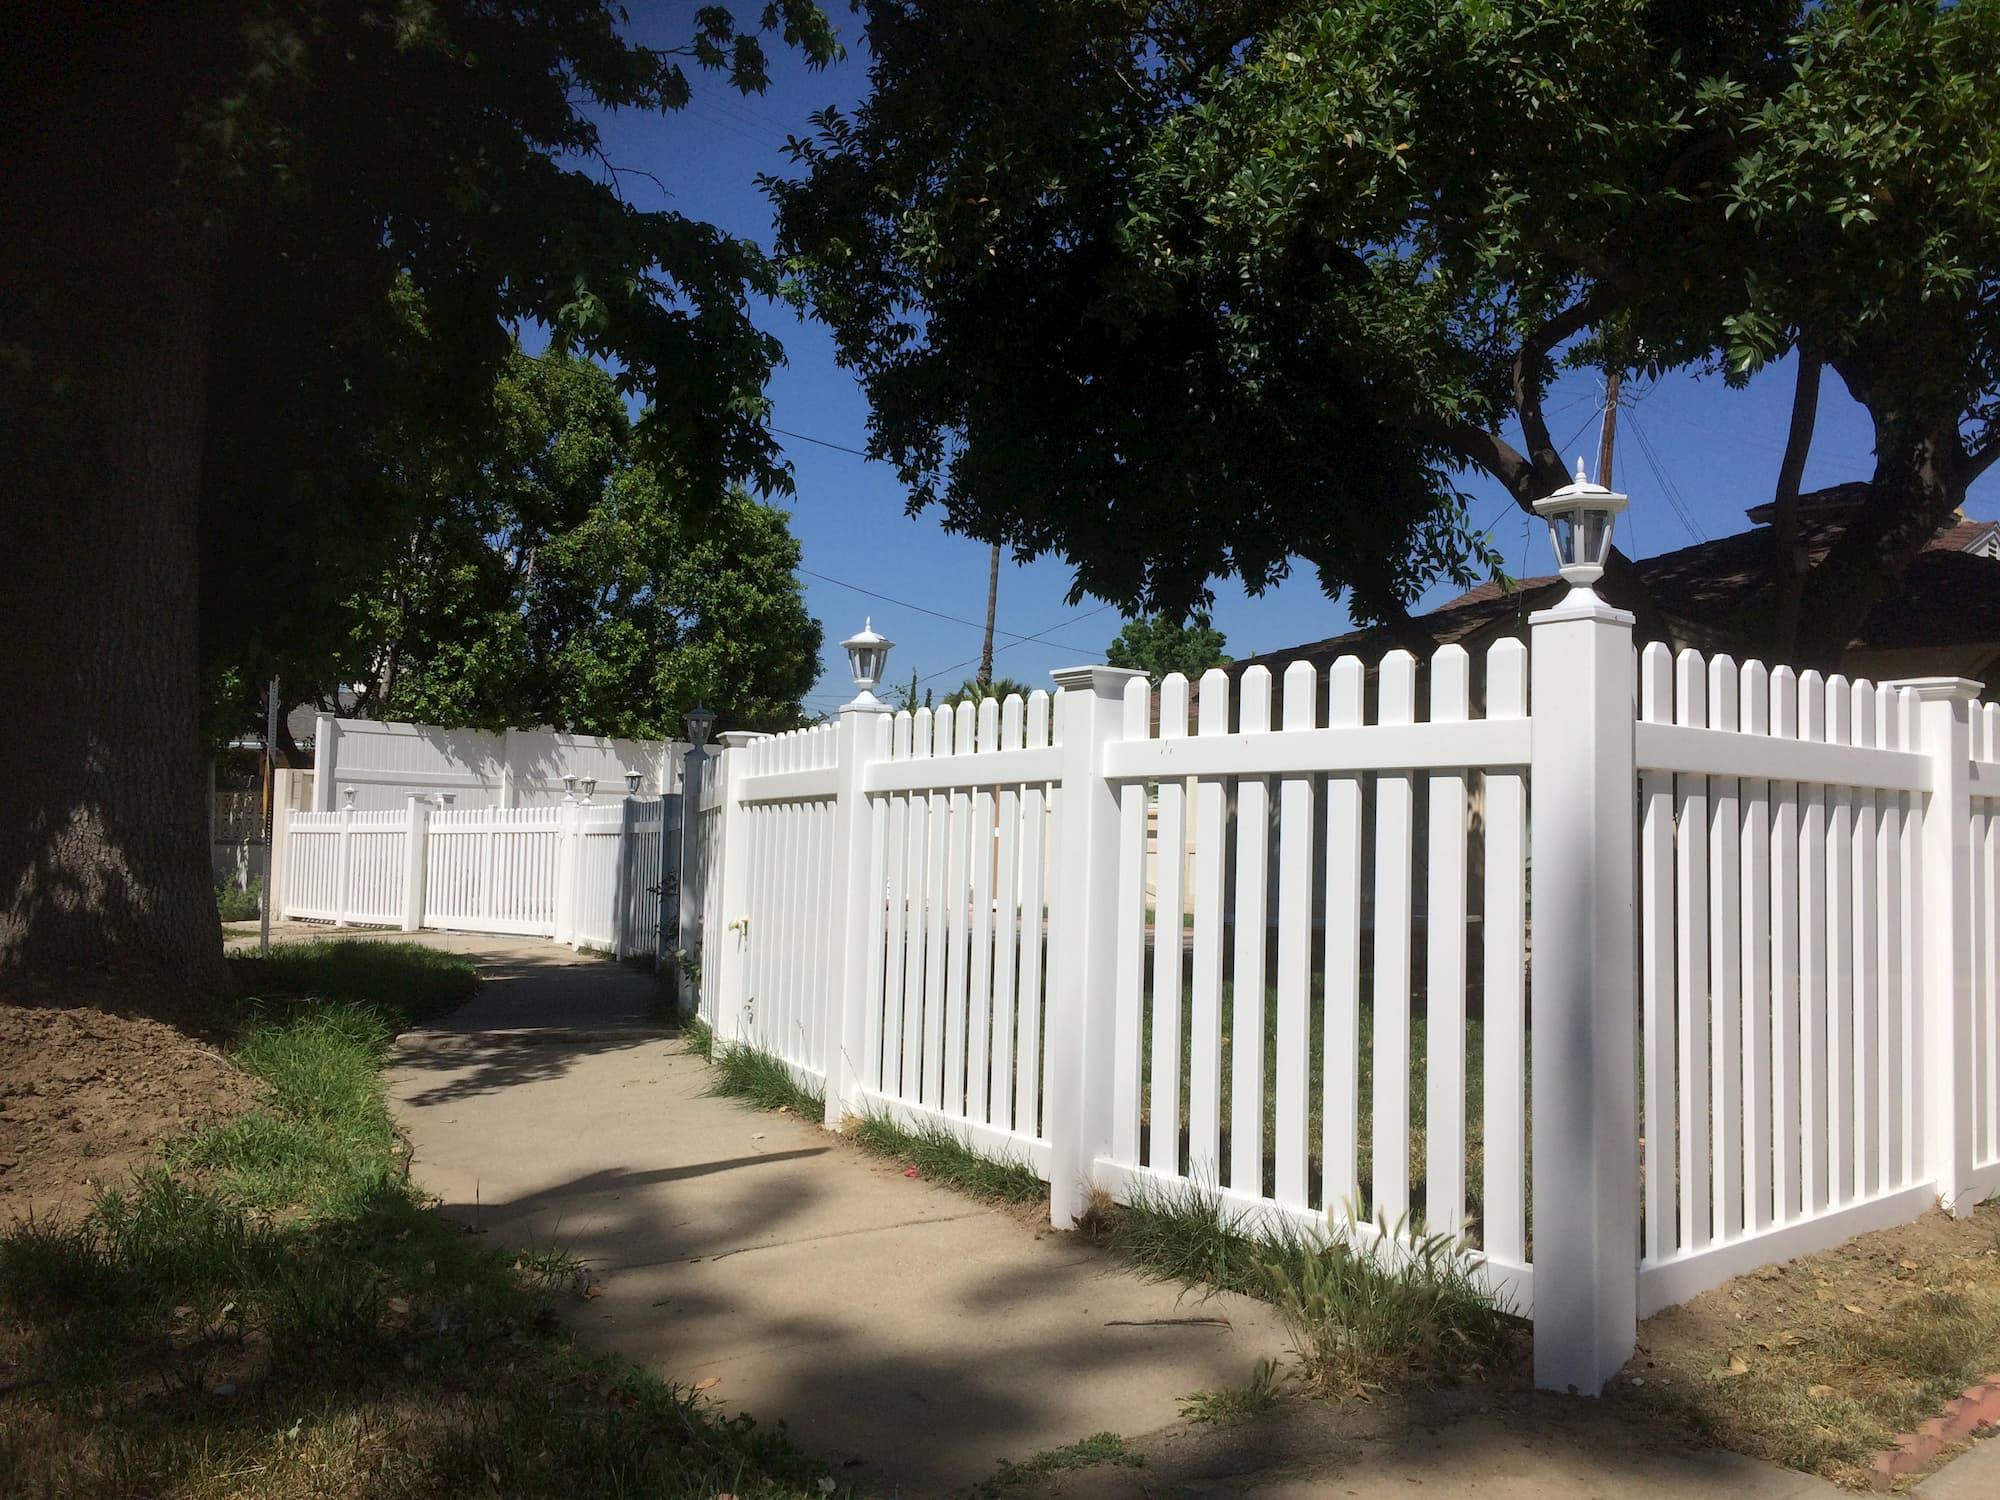 Vinyl Picket Fence